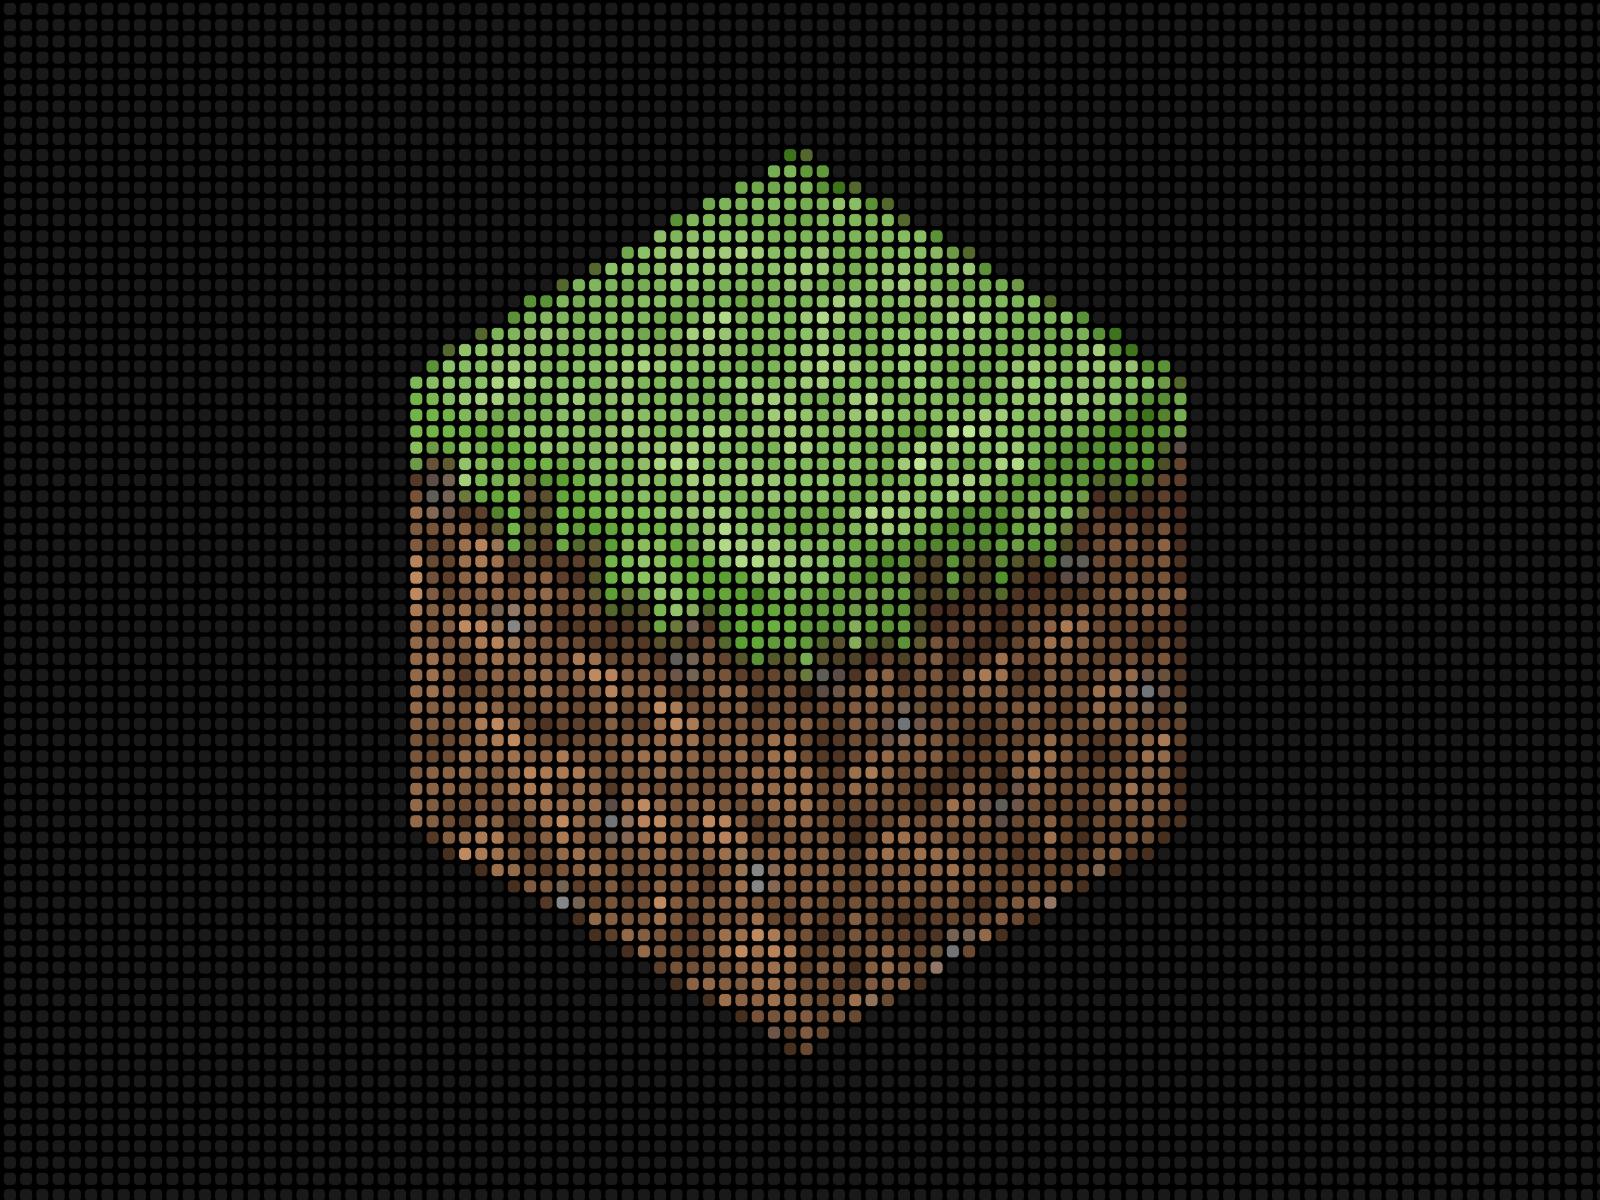 Wonderful Wallpaper Minecraft Dark - wallpaper_minecraft_by_electropeppers-d3jgknb  HD_593593.png